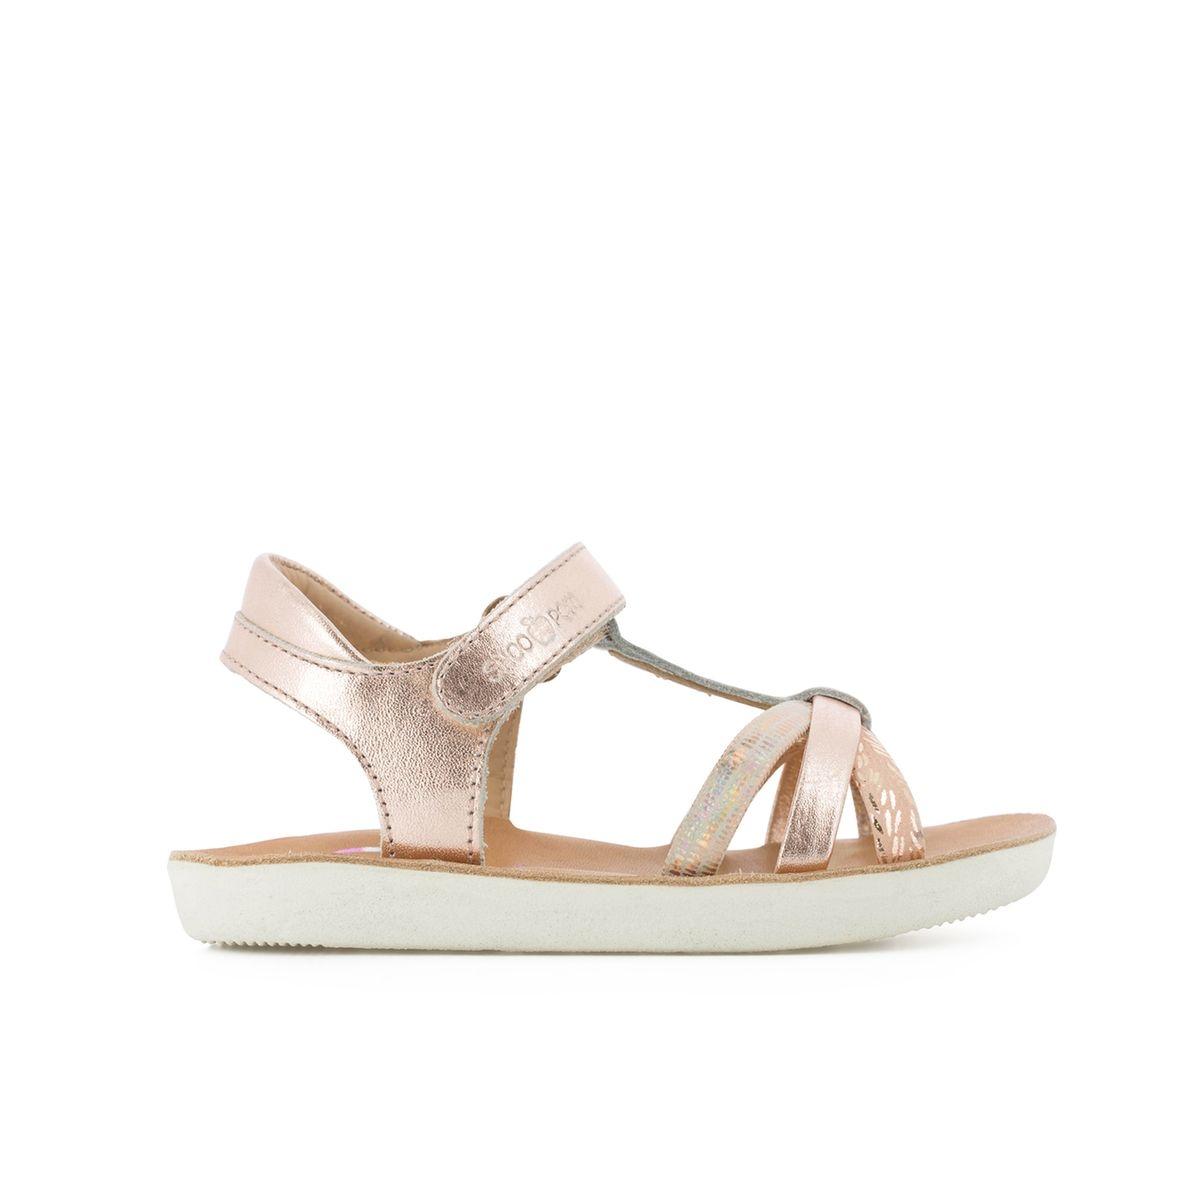 Sandales Goa Salome